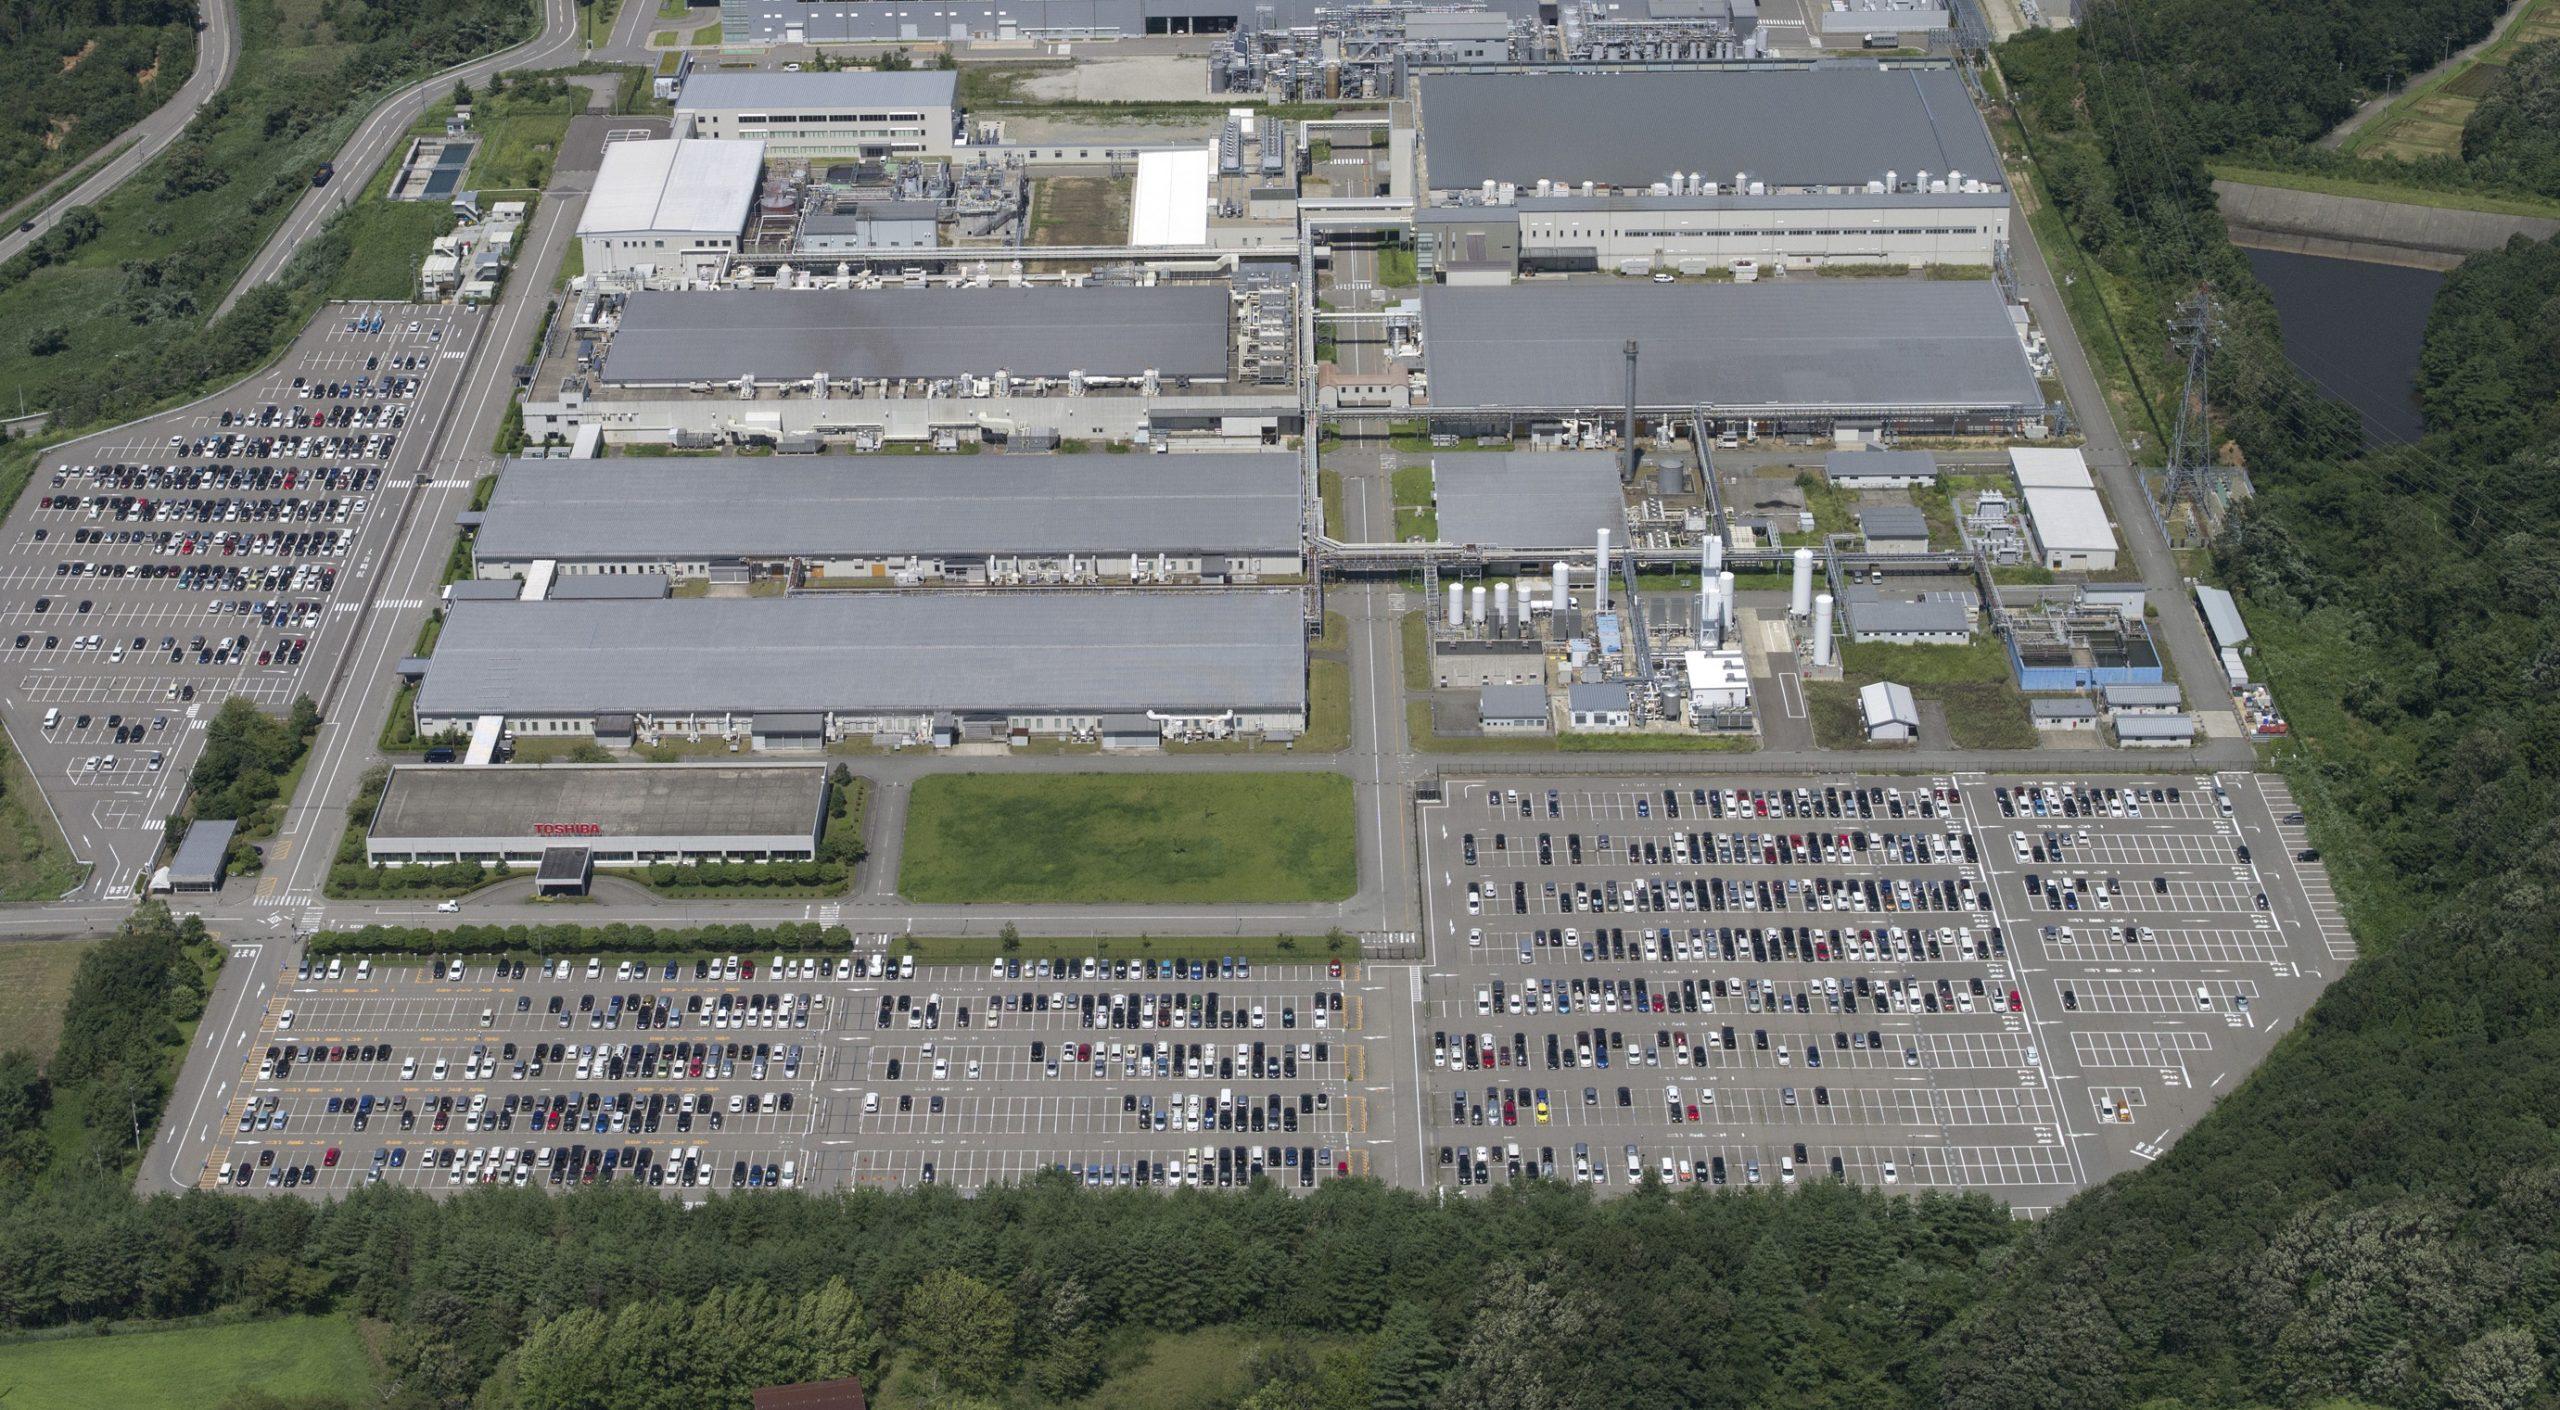 300mmウエハー対応製造ラインが導入される加賀東芝エレクトロニクス株式会社(石川県能美市)